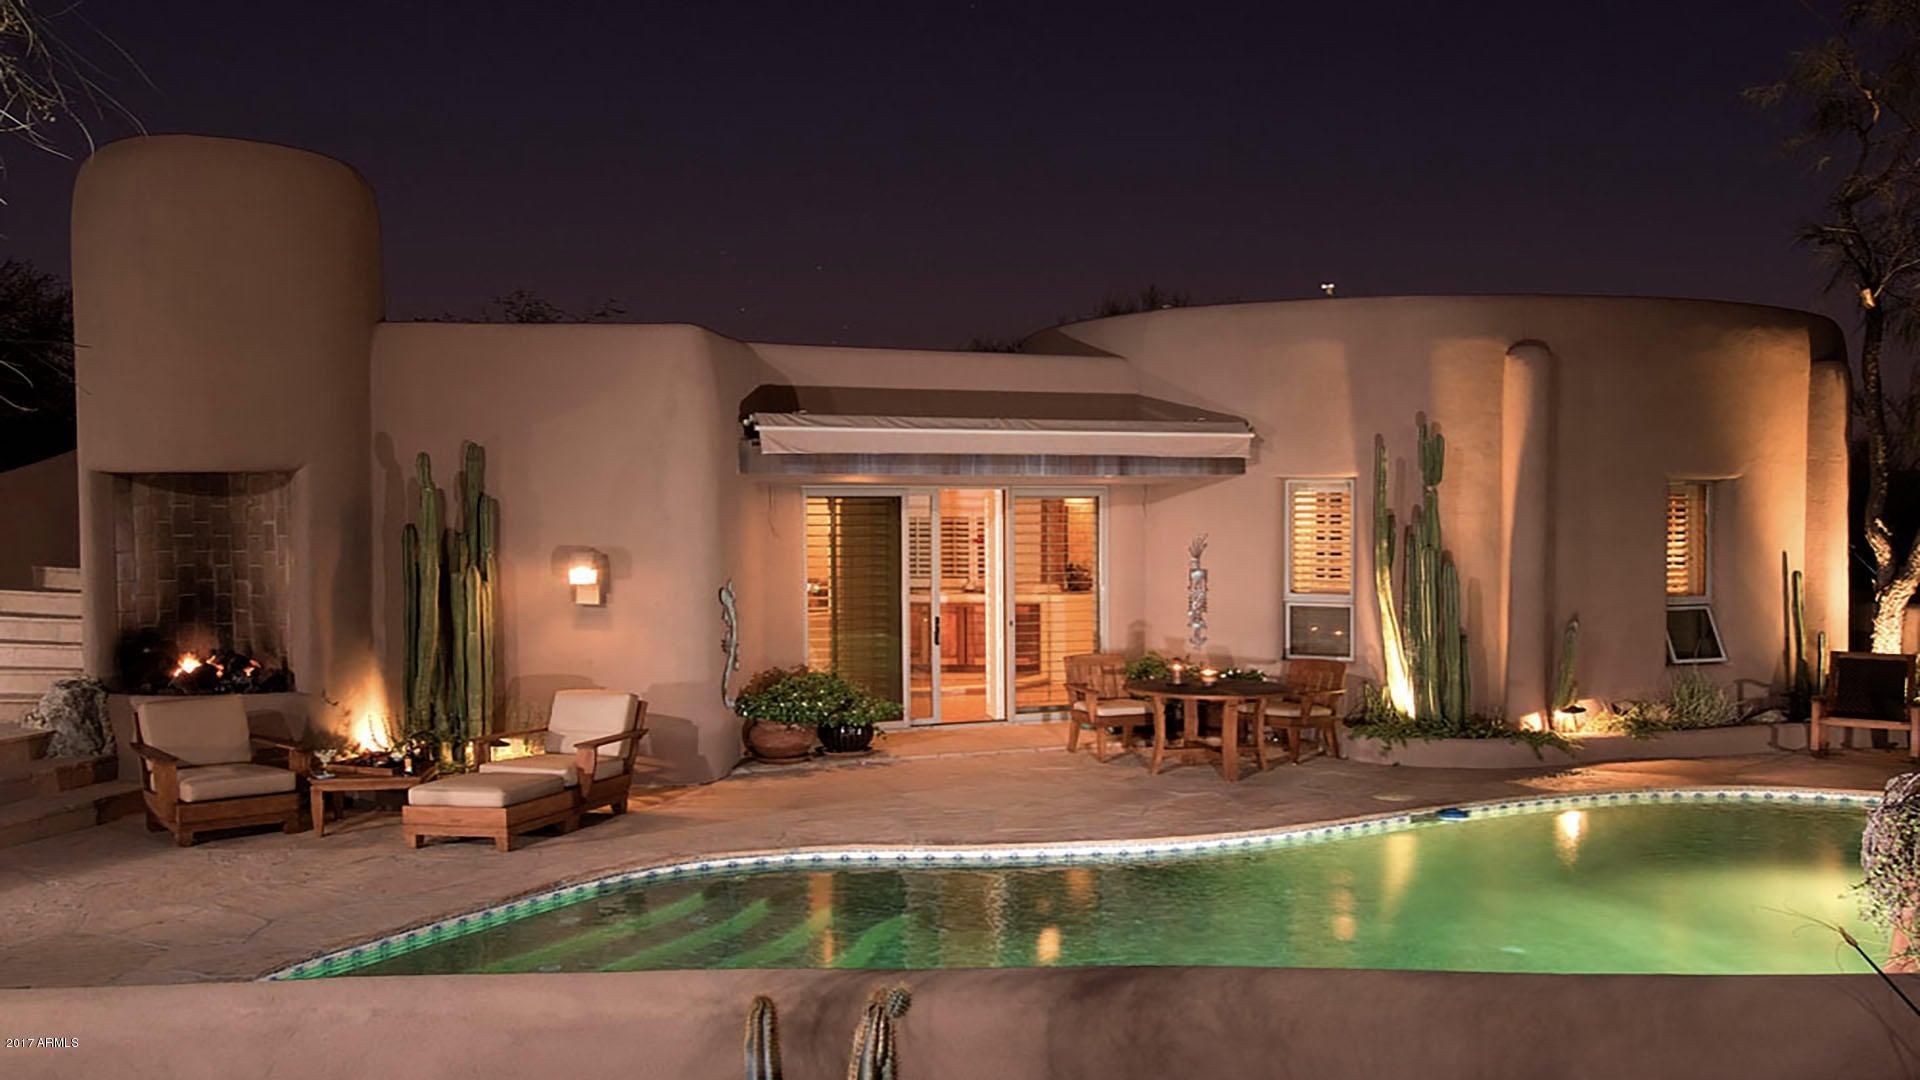 MLS 5586355 35635 N MEANDER Way, Carefree, AZ 85377 Carefree AZ Golf